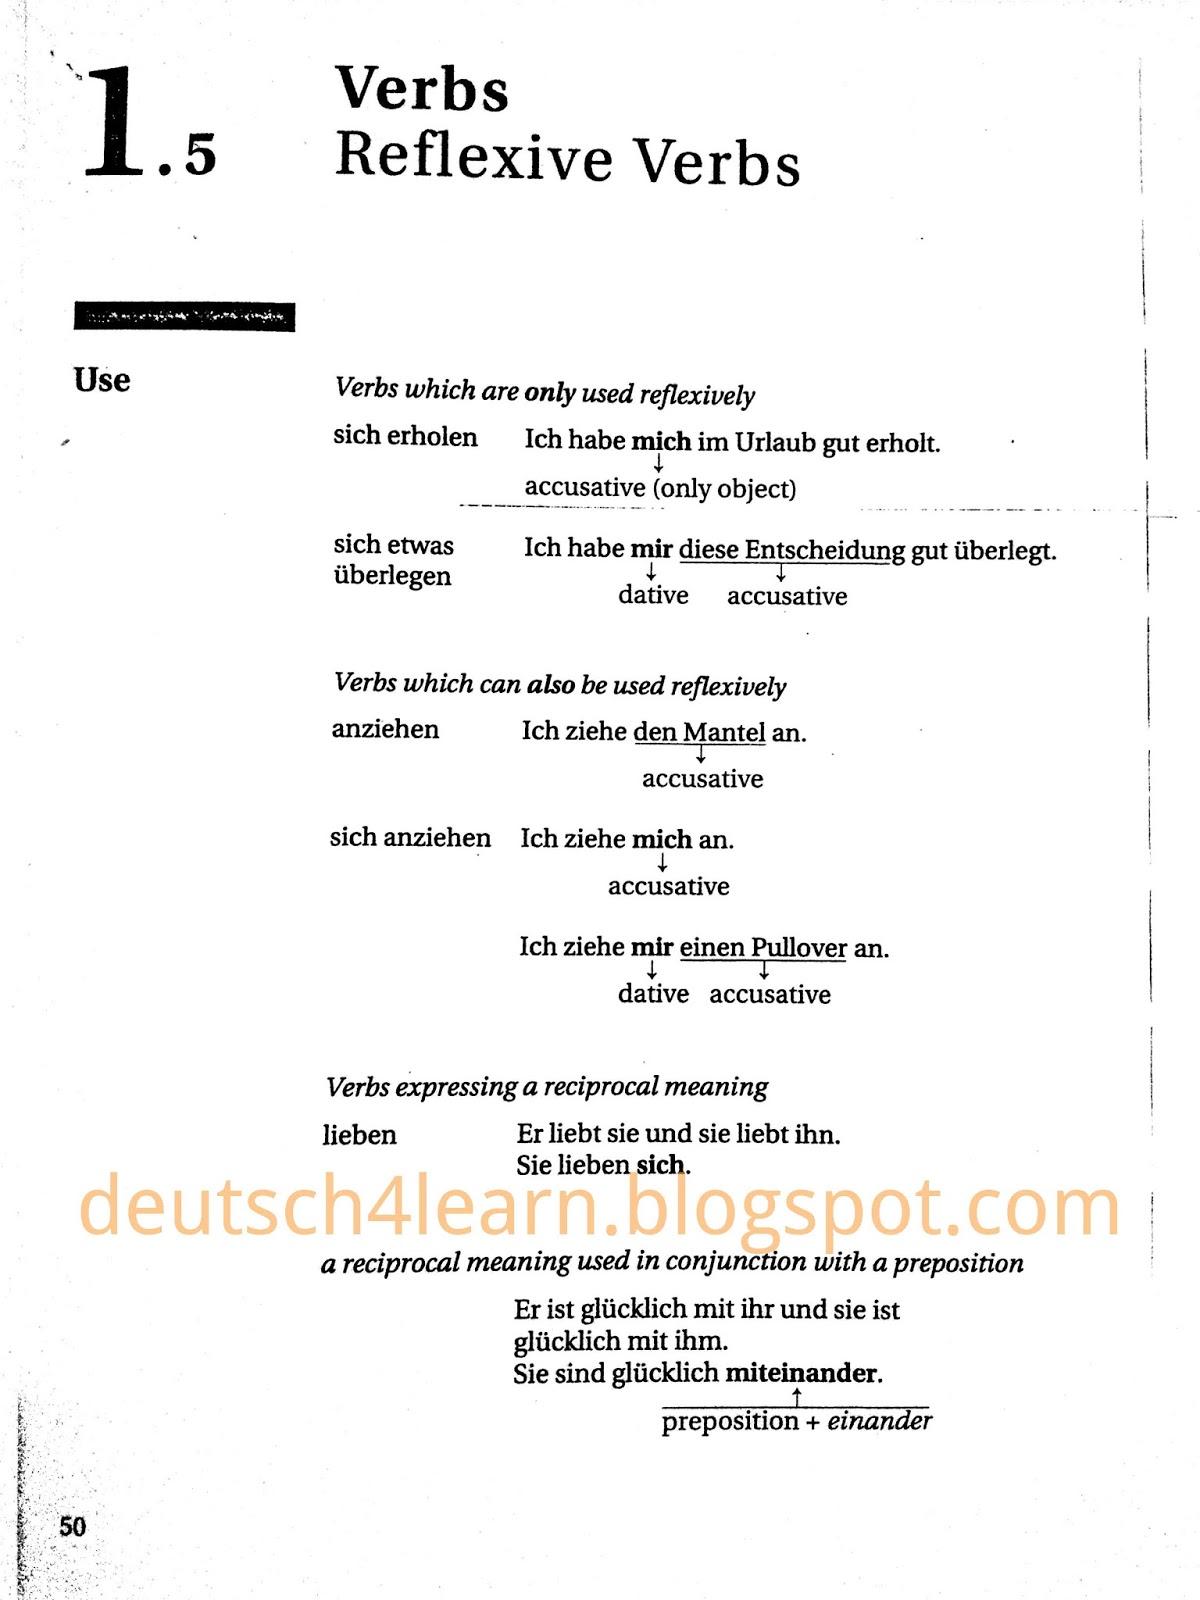 Reflexive Verbs In German Language